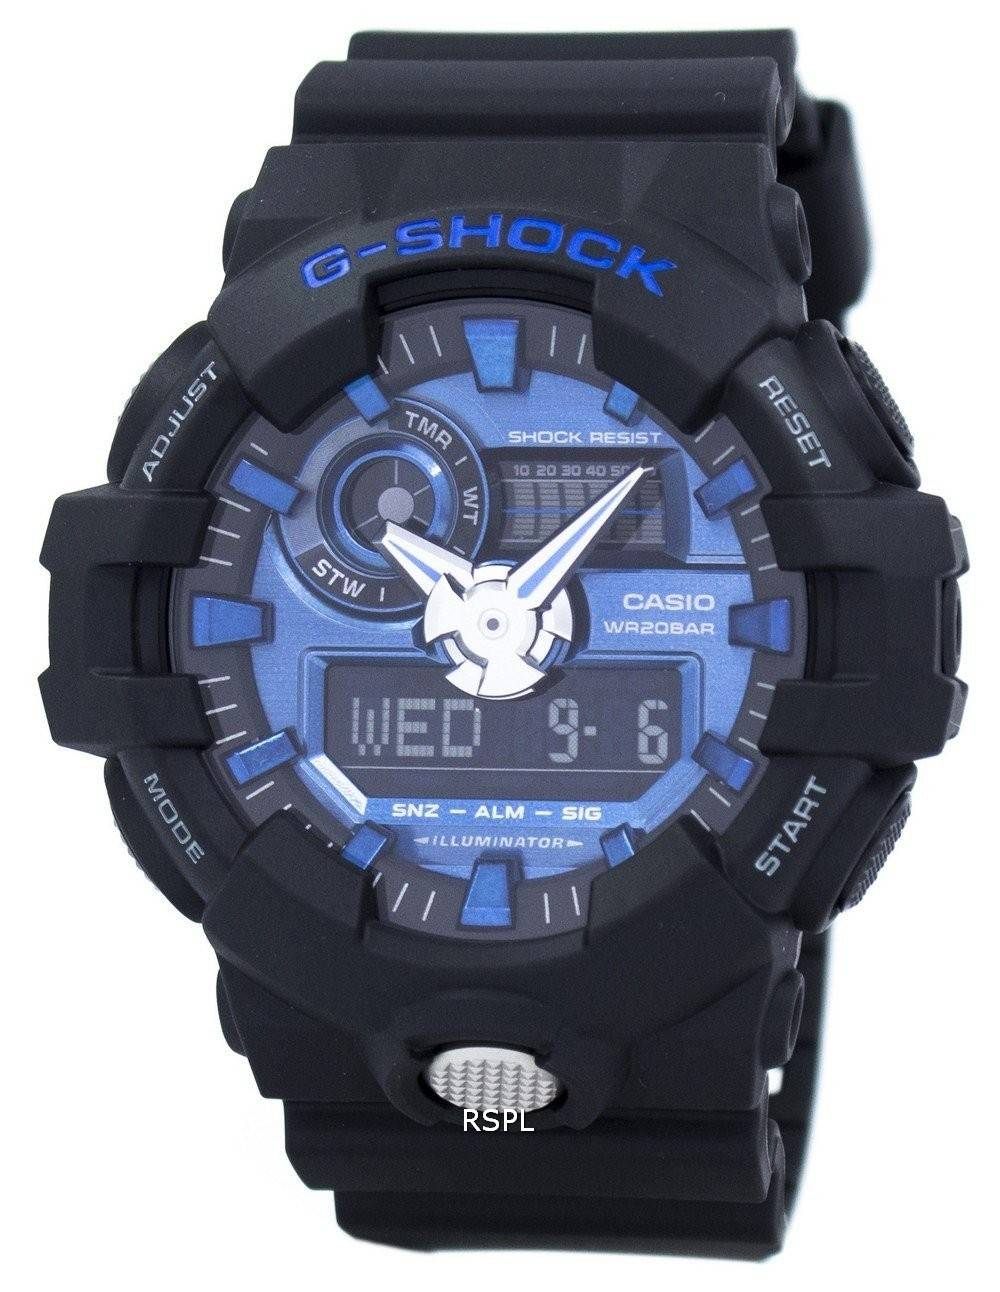 a8646054114 Casio G-Shock Analog Digital 200M GA-710-1A2 Men s Watch ...